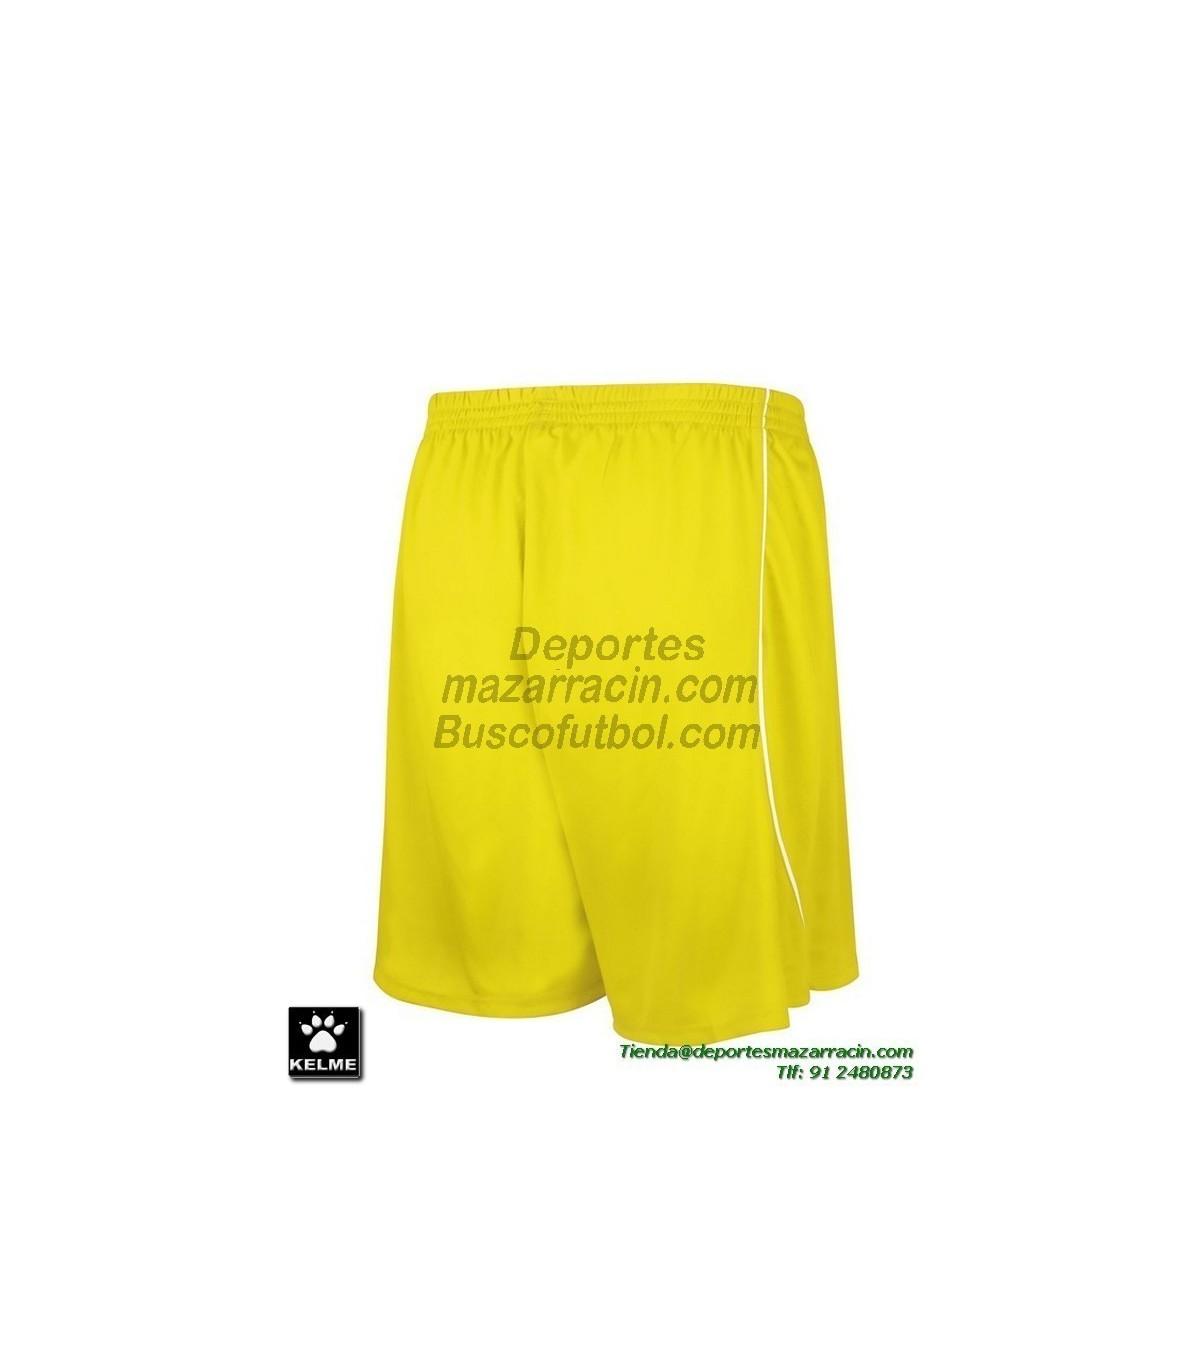 184c6b7e58 KELME PANTALON CORTO MUNDIAL Futbol color AMARILLO equipacion short SPORT  ...